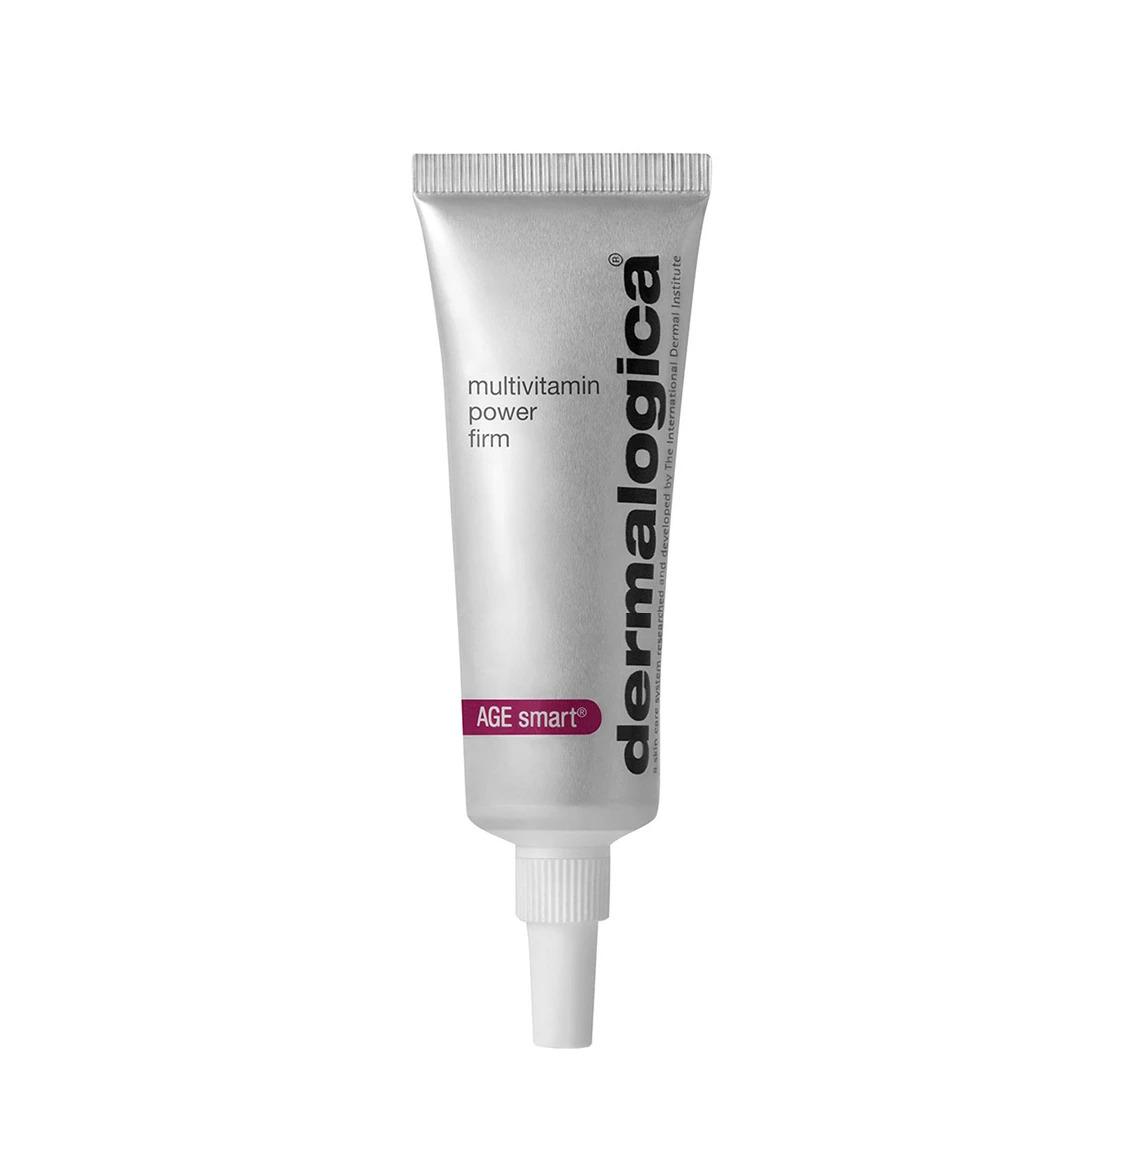 Dermalogica Age Smart MultiVitamin Power Firm Eye Cream 15ml